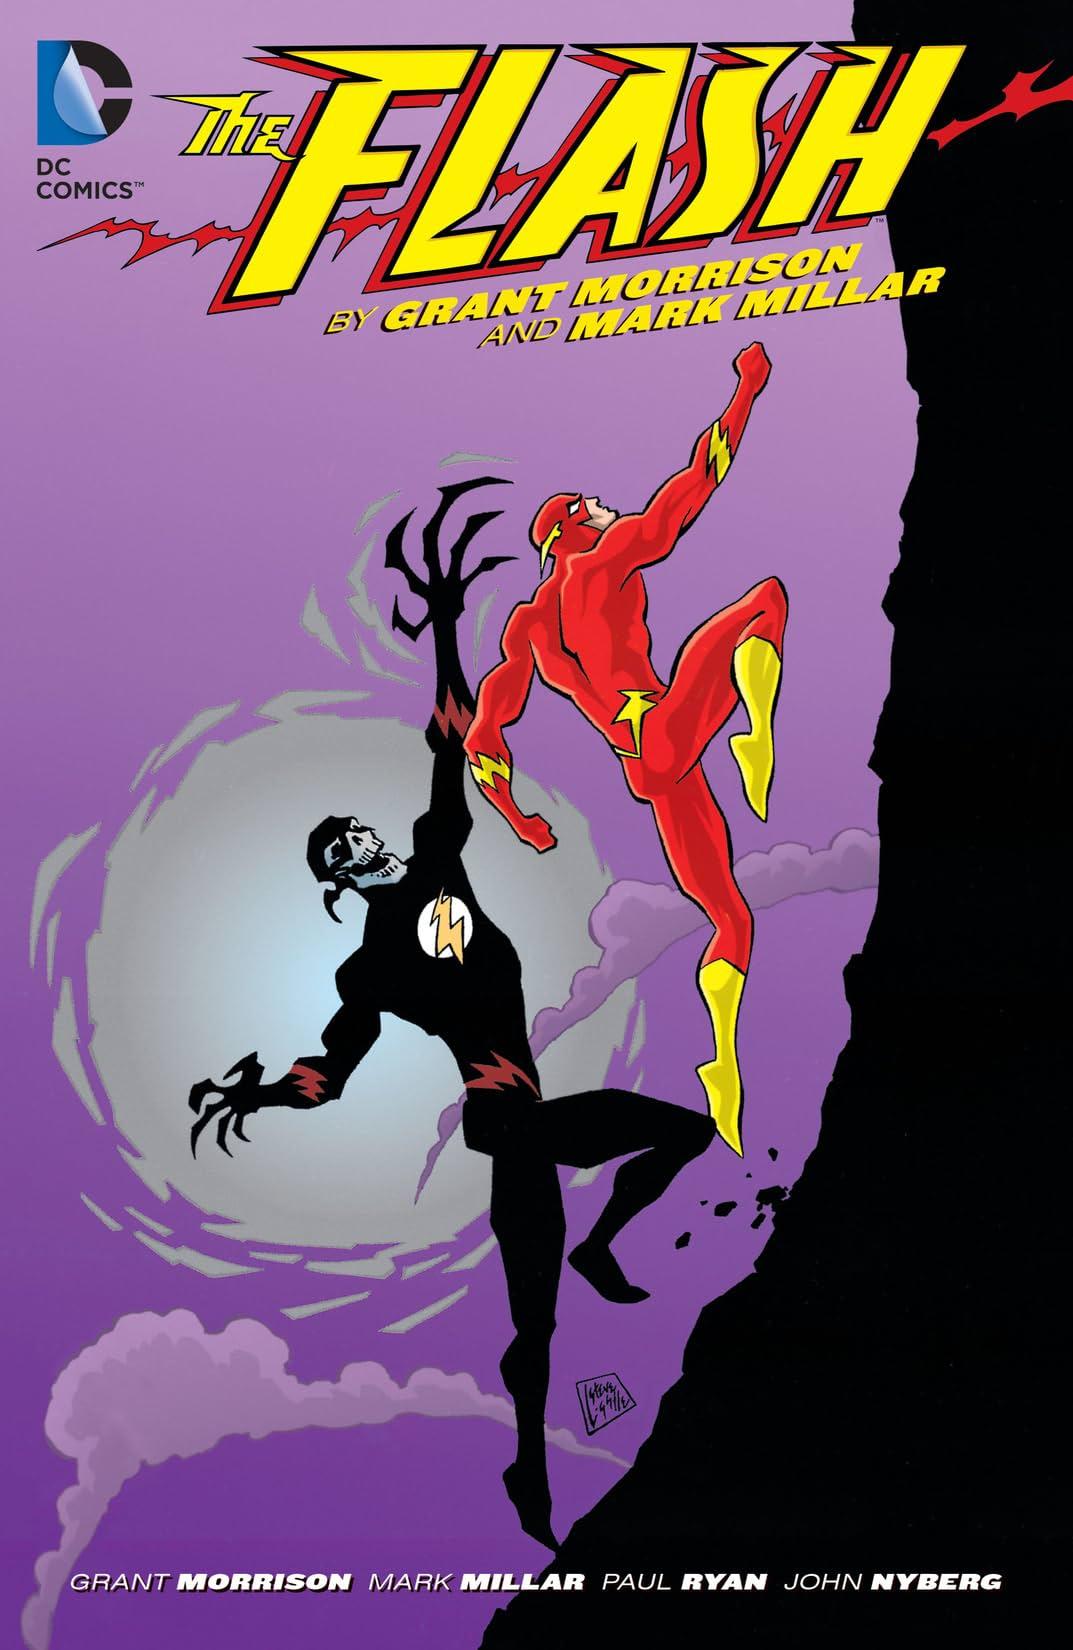 The Flash by Grant Morrison & Mark Millar